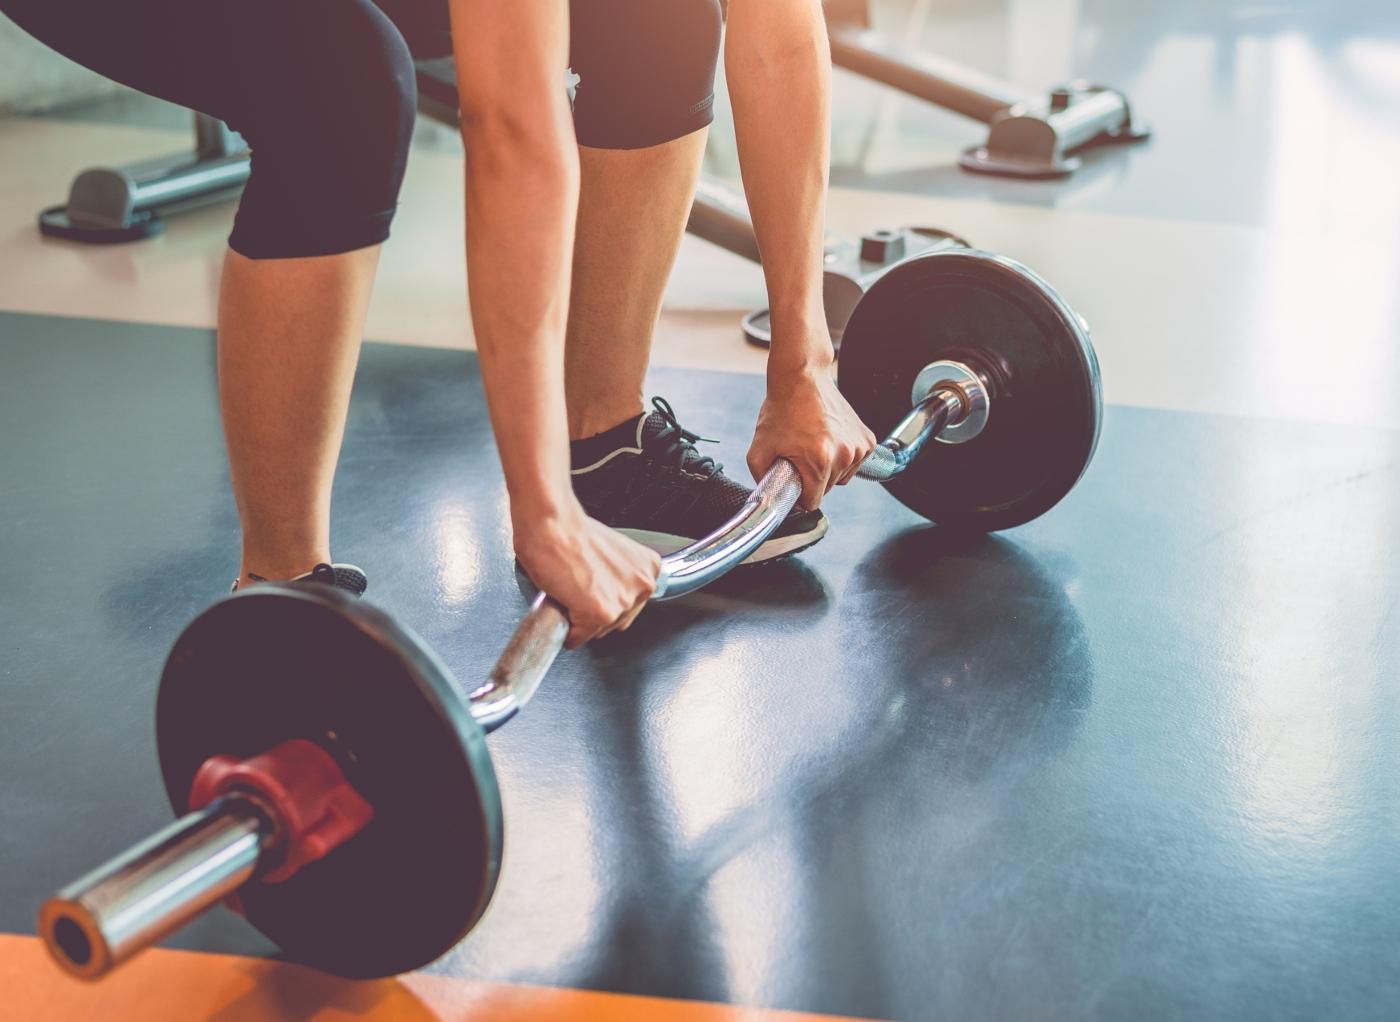 Mulher a fazer treino para ganhar massa muscular